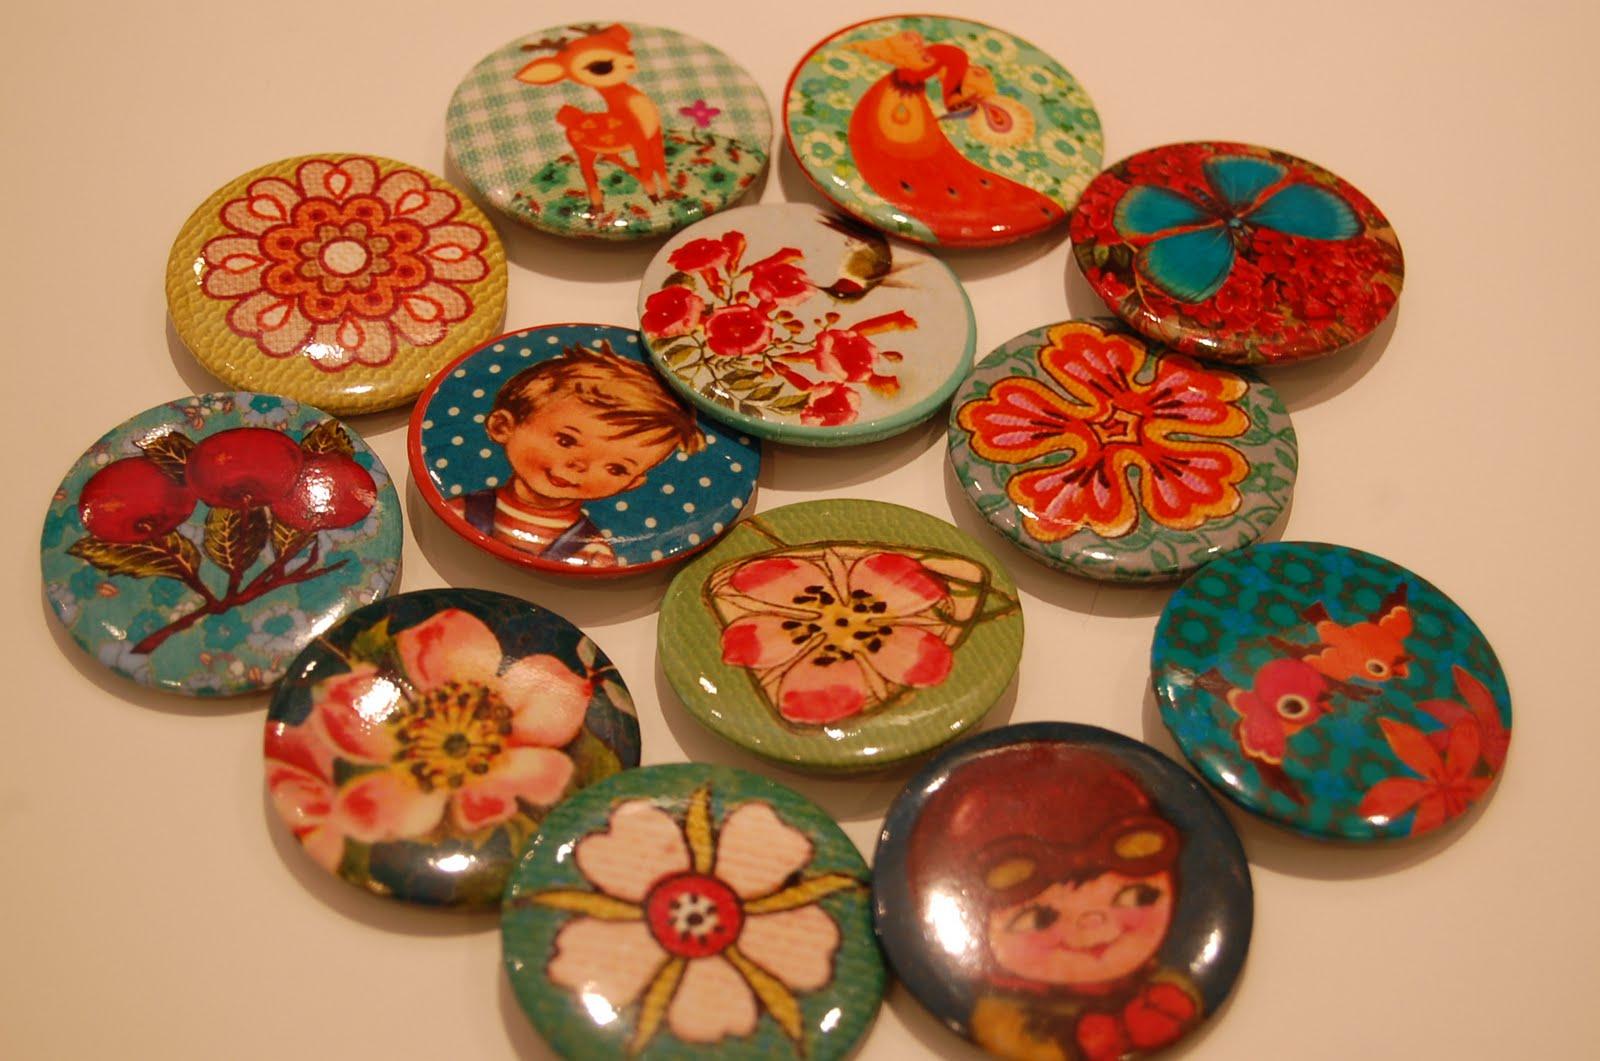 http://2.bp.blogspot.com/-8c6-wSVkaPQ/TiFw-gNzImI/AAAAAAAAAsQ/XVSiL0kFtBg/s1600/Froy%2526Dind-badges.JPG